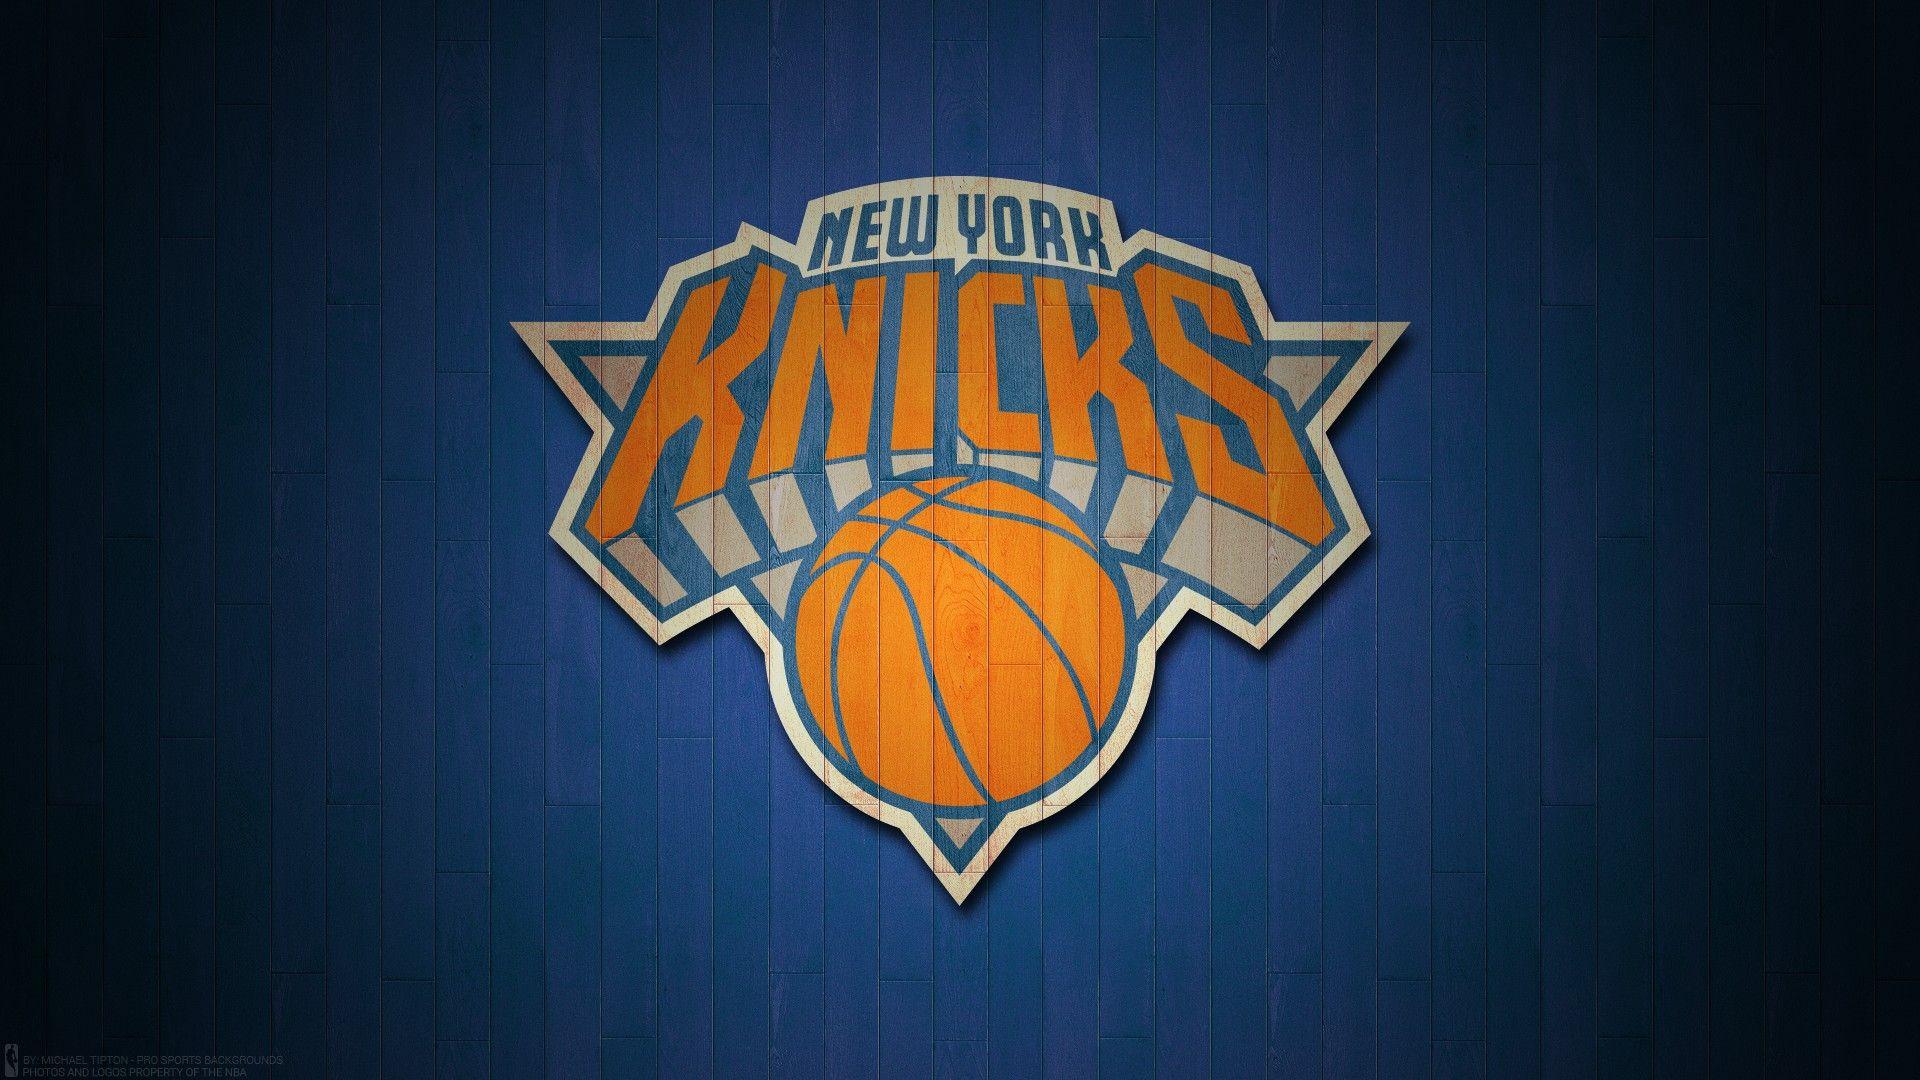 Ny Knicks Wallpaper Hd New York Knicks Nba Wallpapers New York Knicks Logo